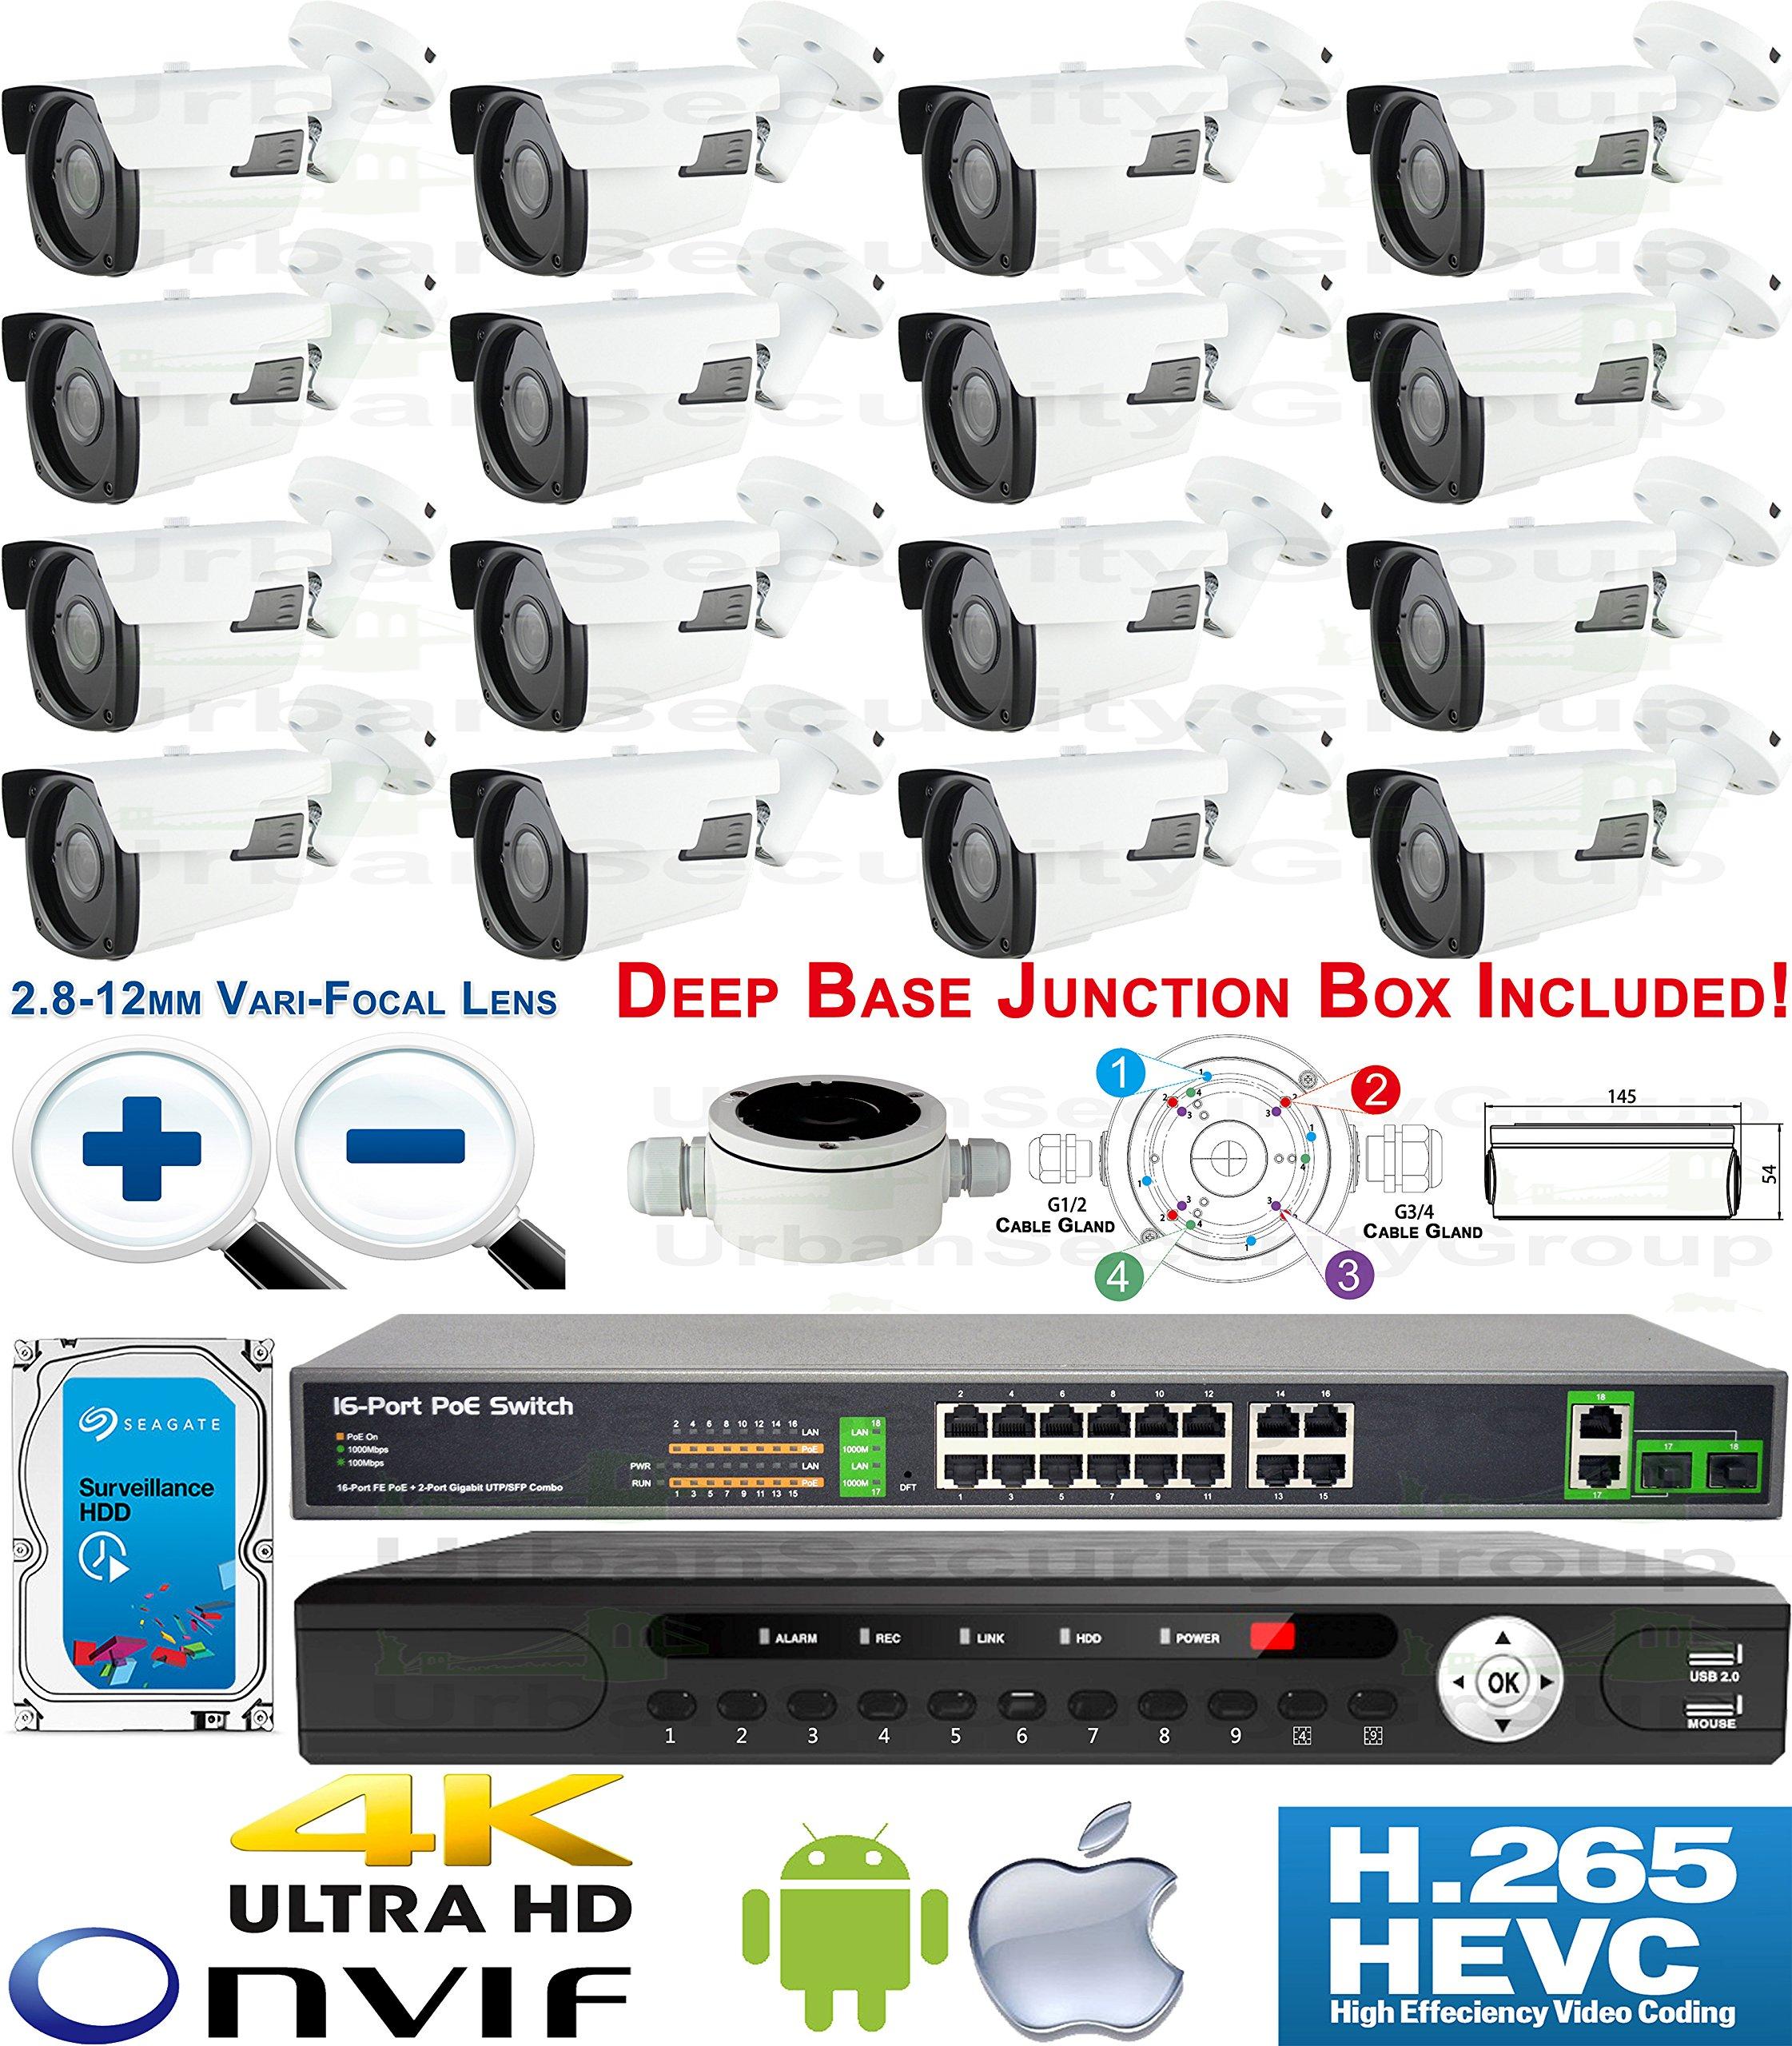 USG Motorized Lens 4MP 16 Camera Security System H.265 Ultra 4K PoE IP CCTV Kit : 16x 4MP 2.8-12mm 5MP Bullet Camera + 1x 36 Channel 8MP NVR + 1x 10 Port PoE Network Switch + 1x 4TB : Business Grade